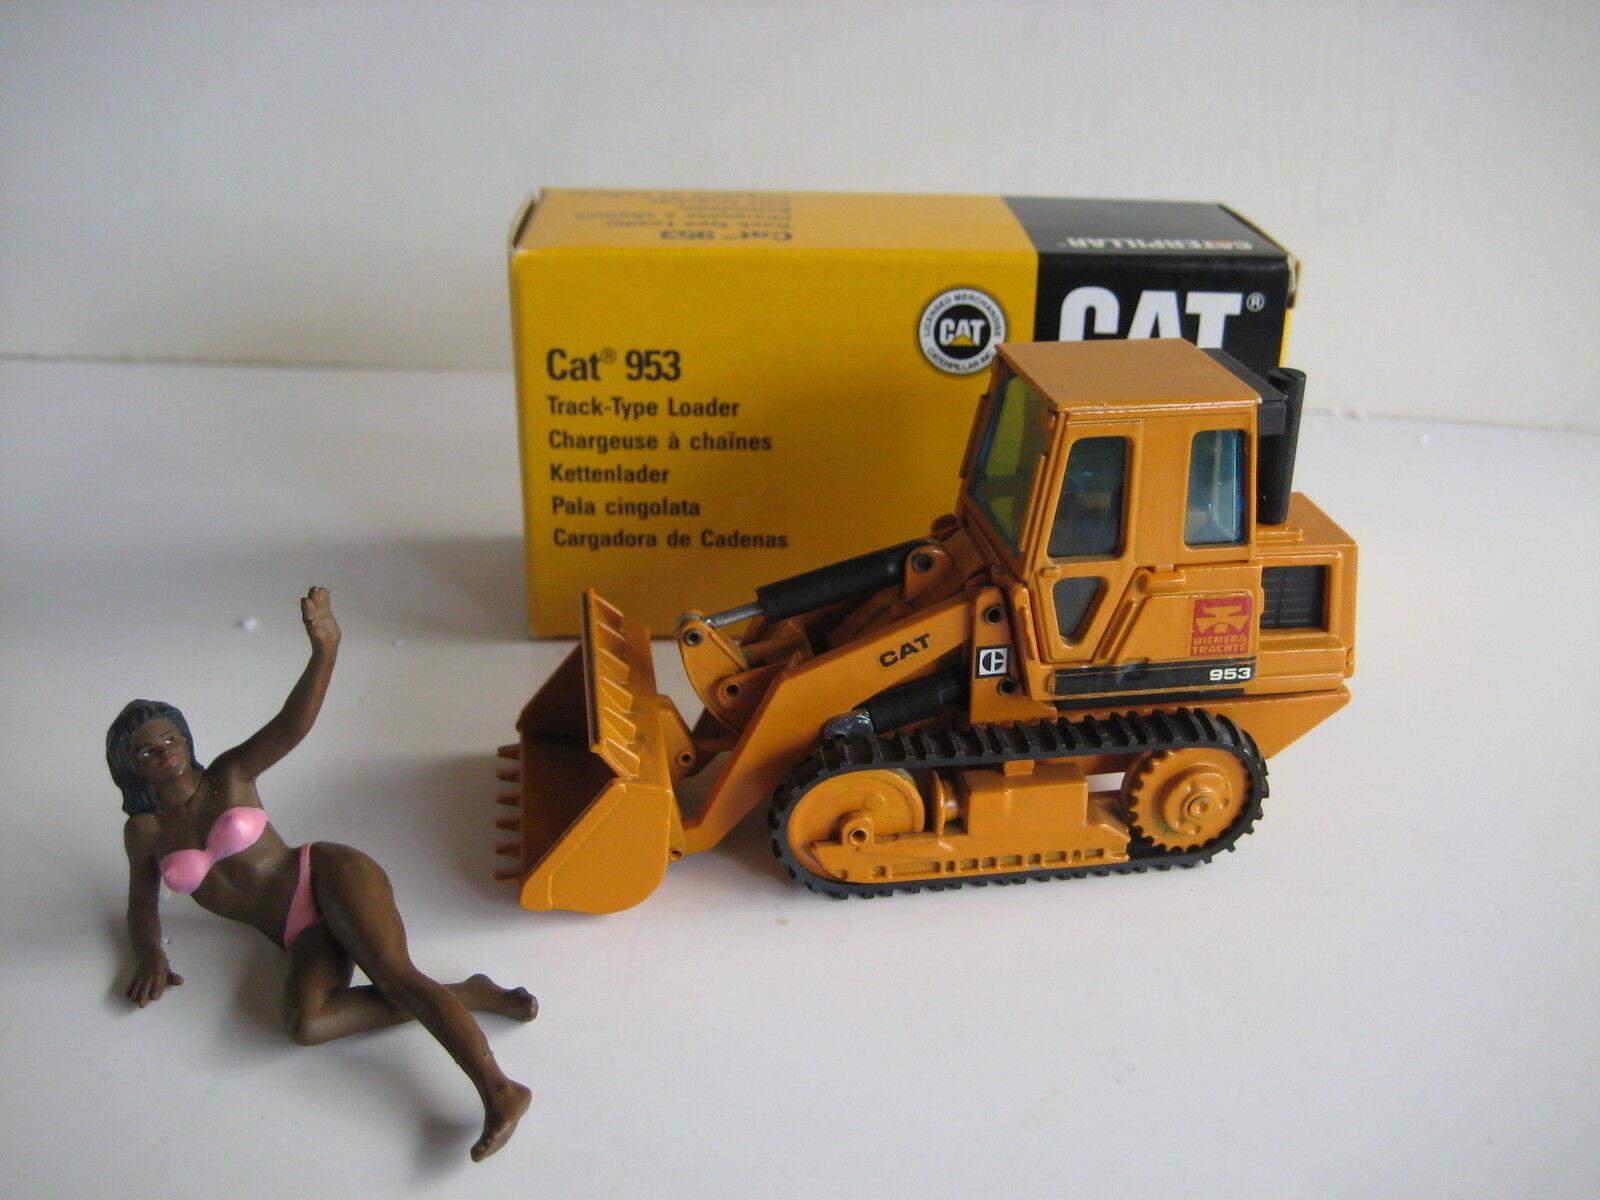 Cocheguero Caterpillar 953 wiemer & trachte 35repas 223.3 NZG 1  50 cajas